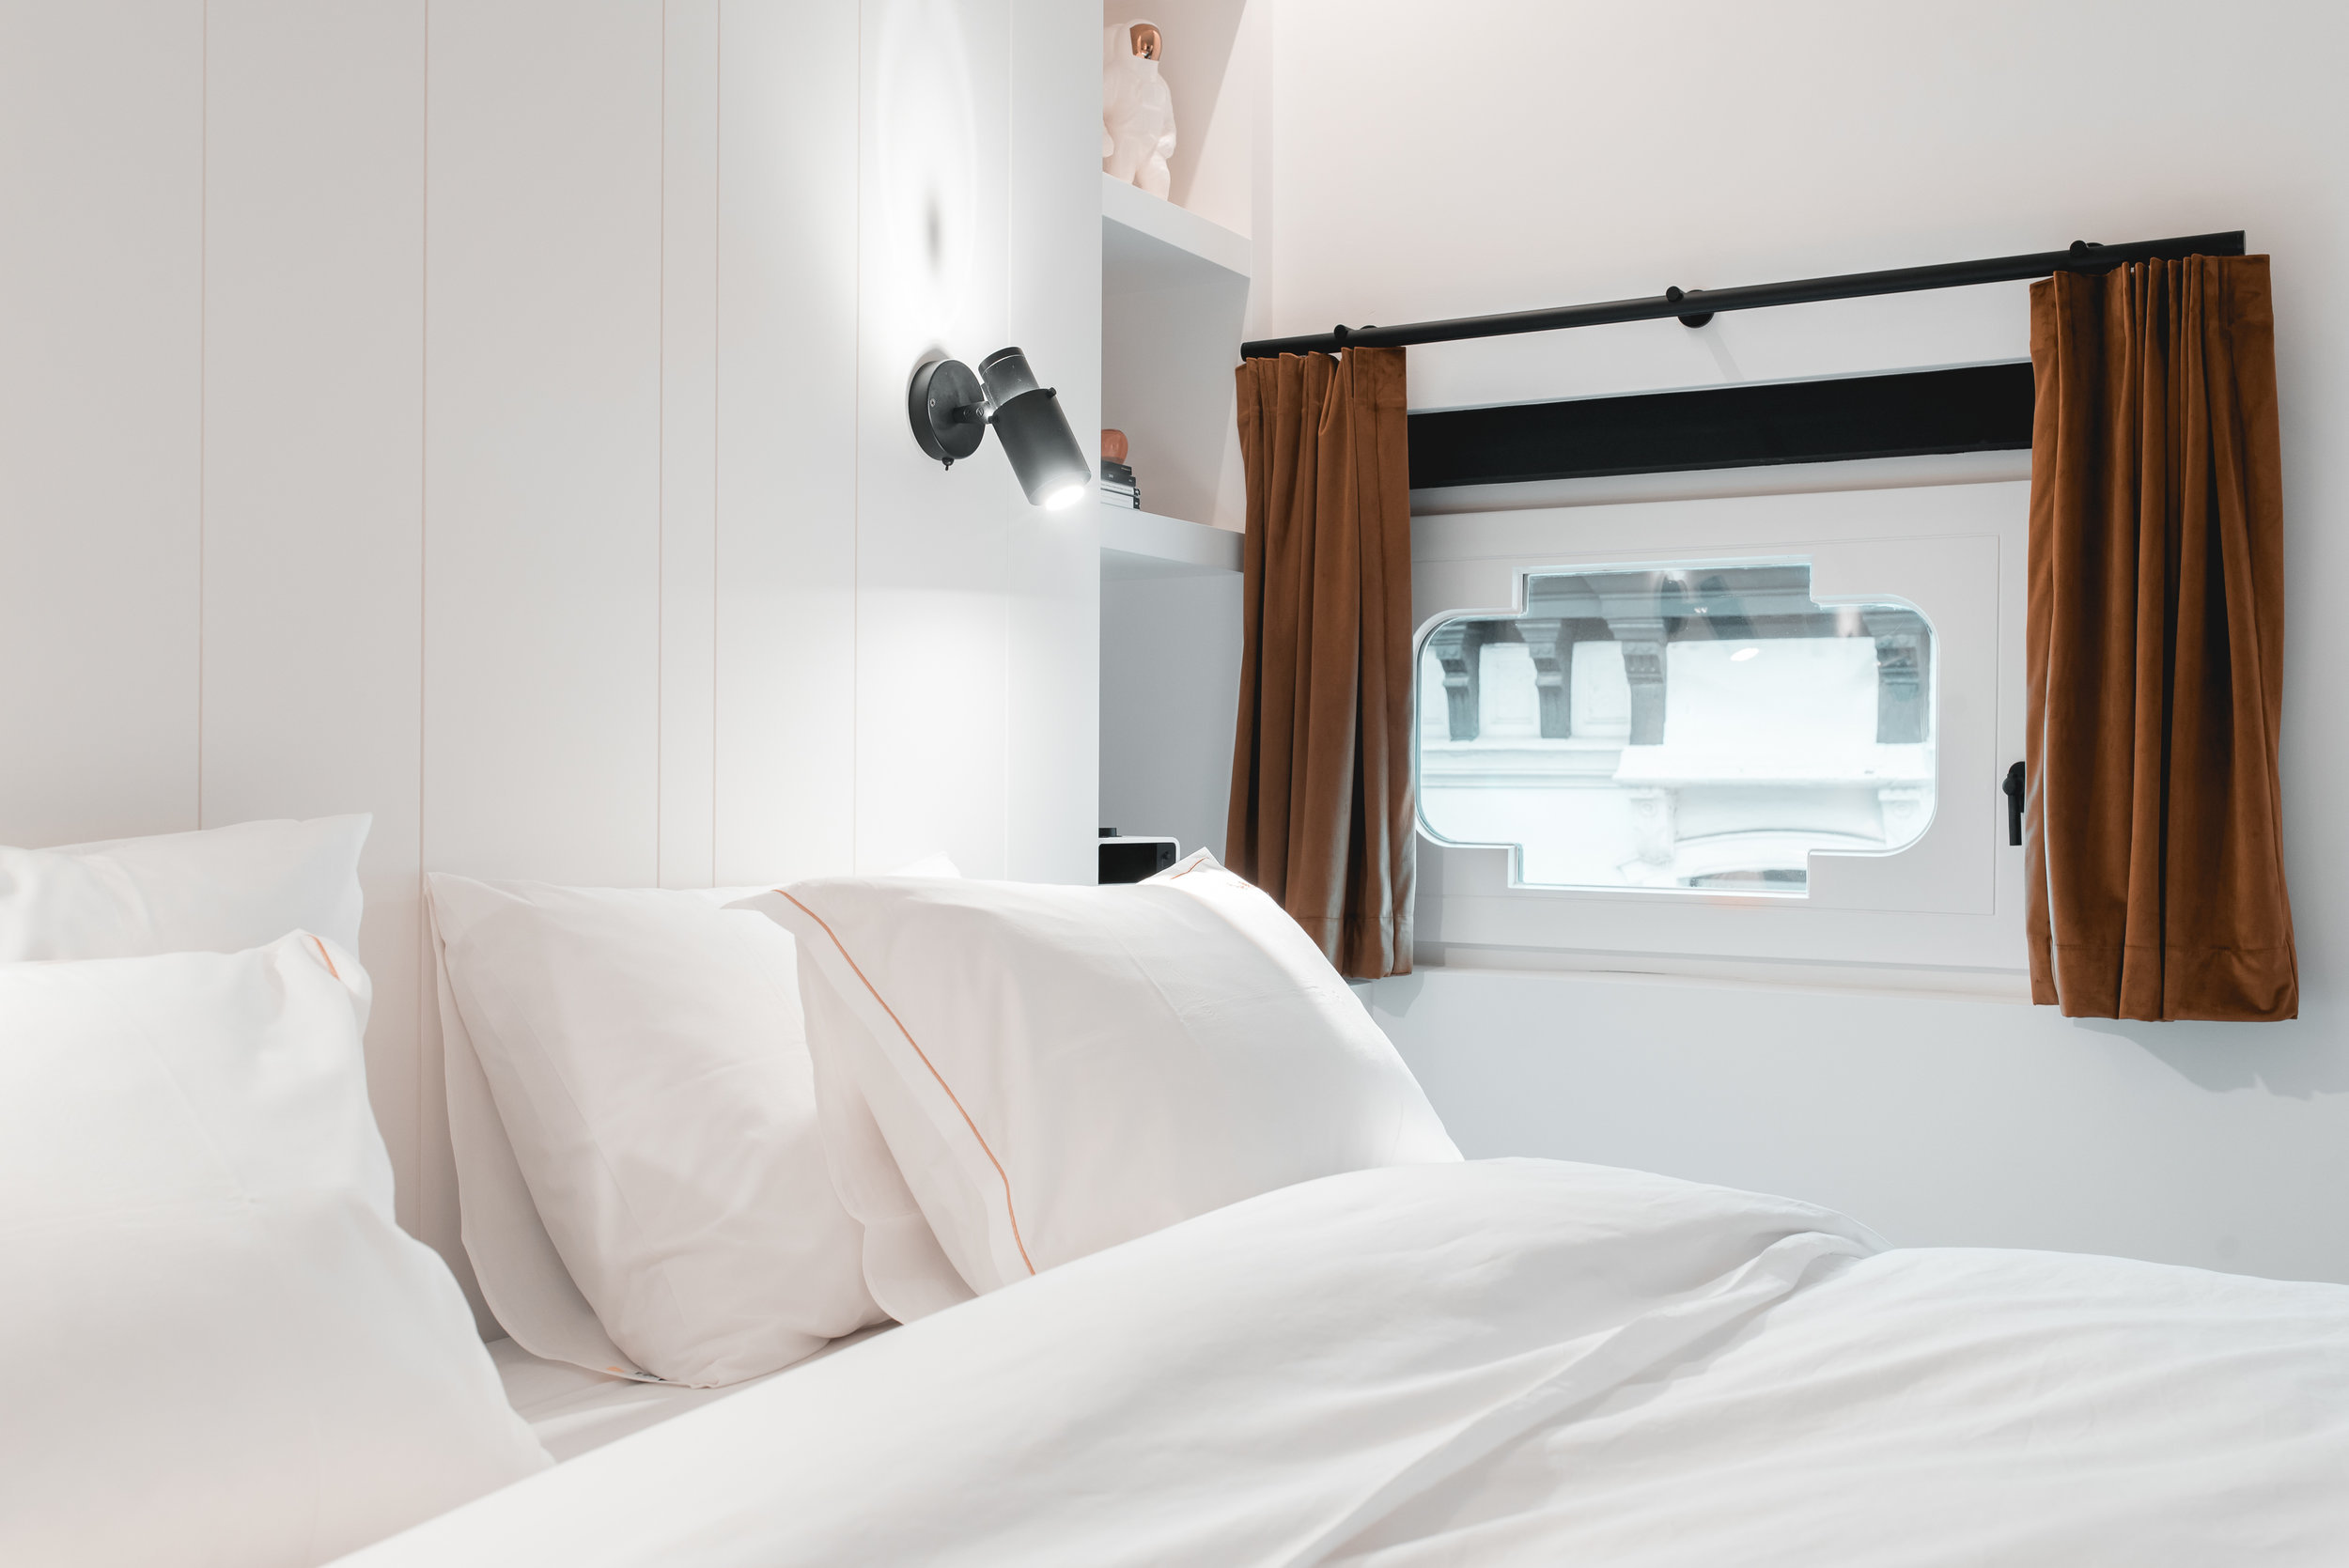 HotelRigaMaxikamera-4.jpg